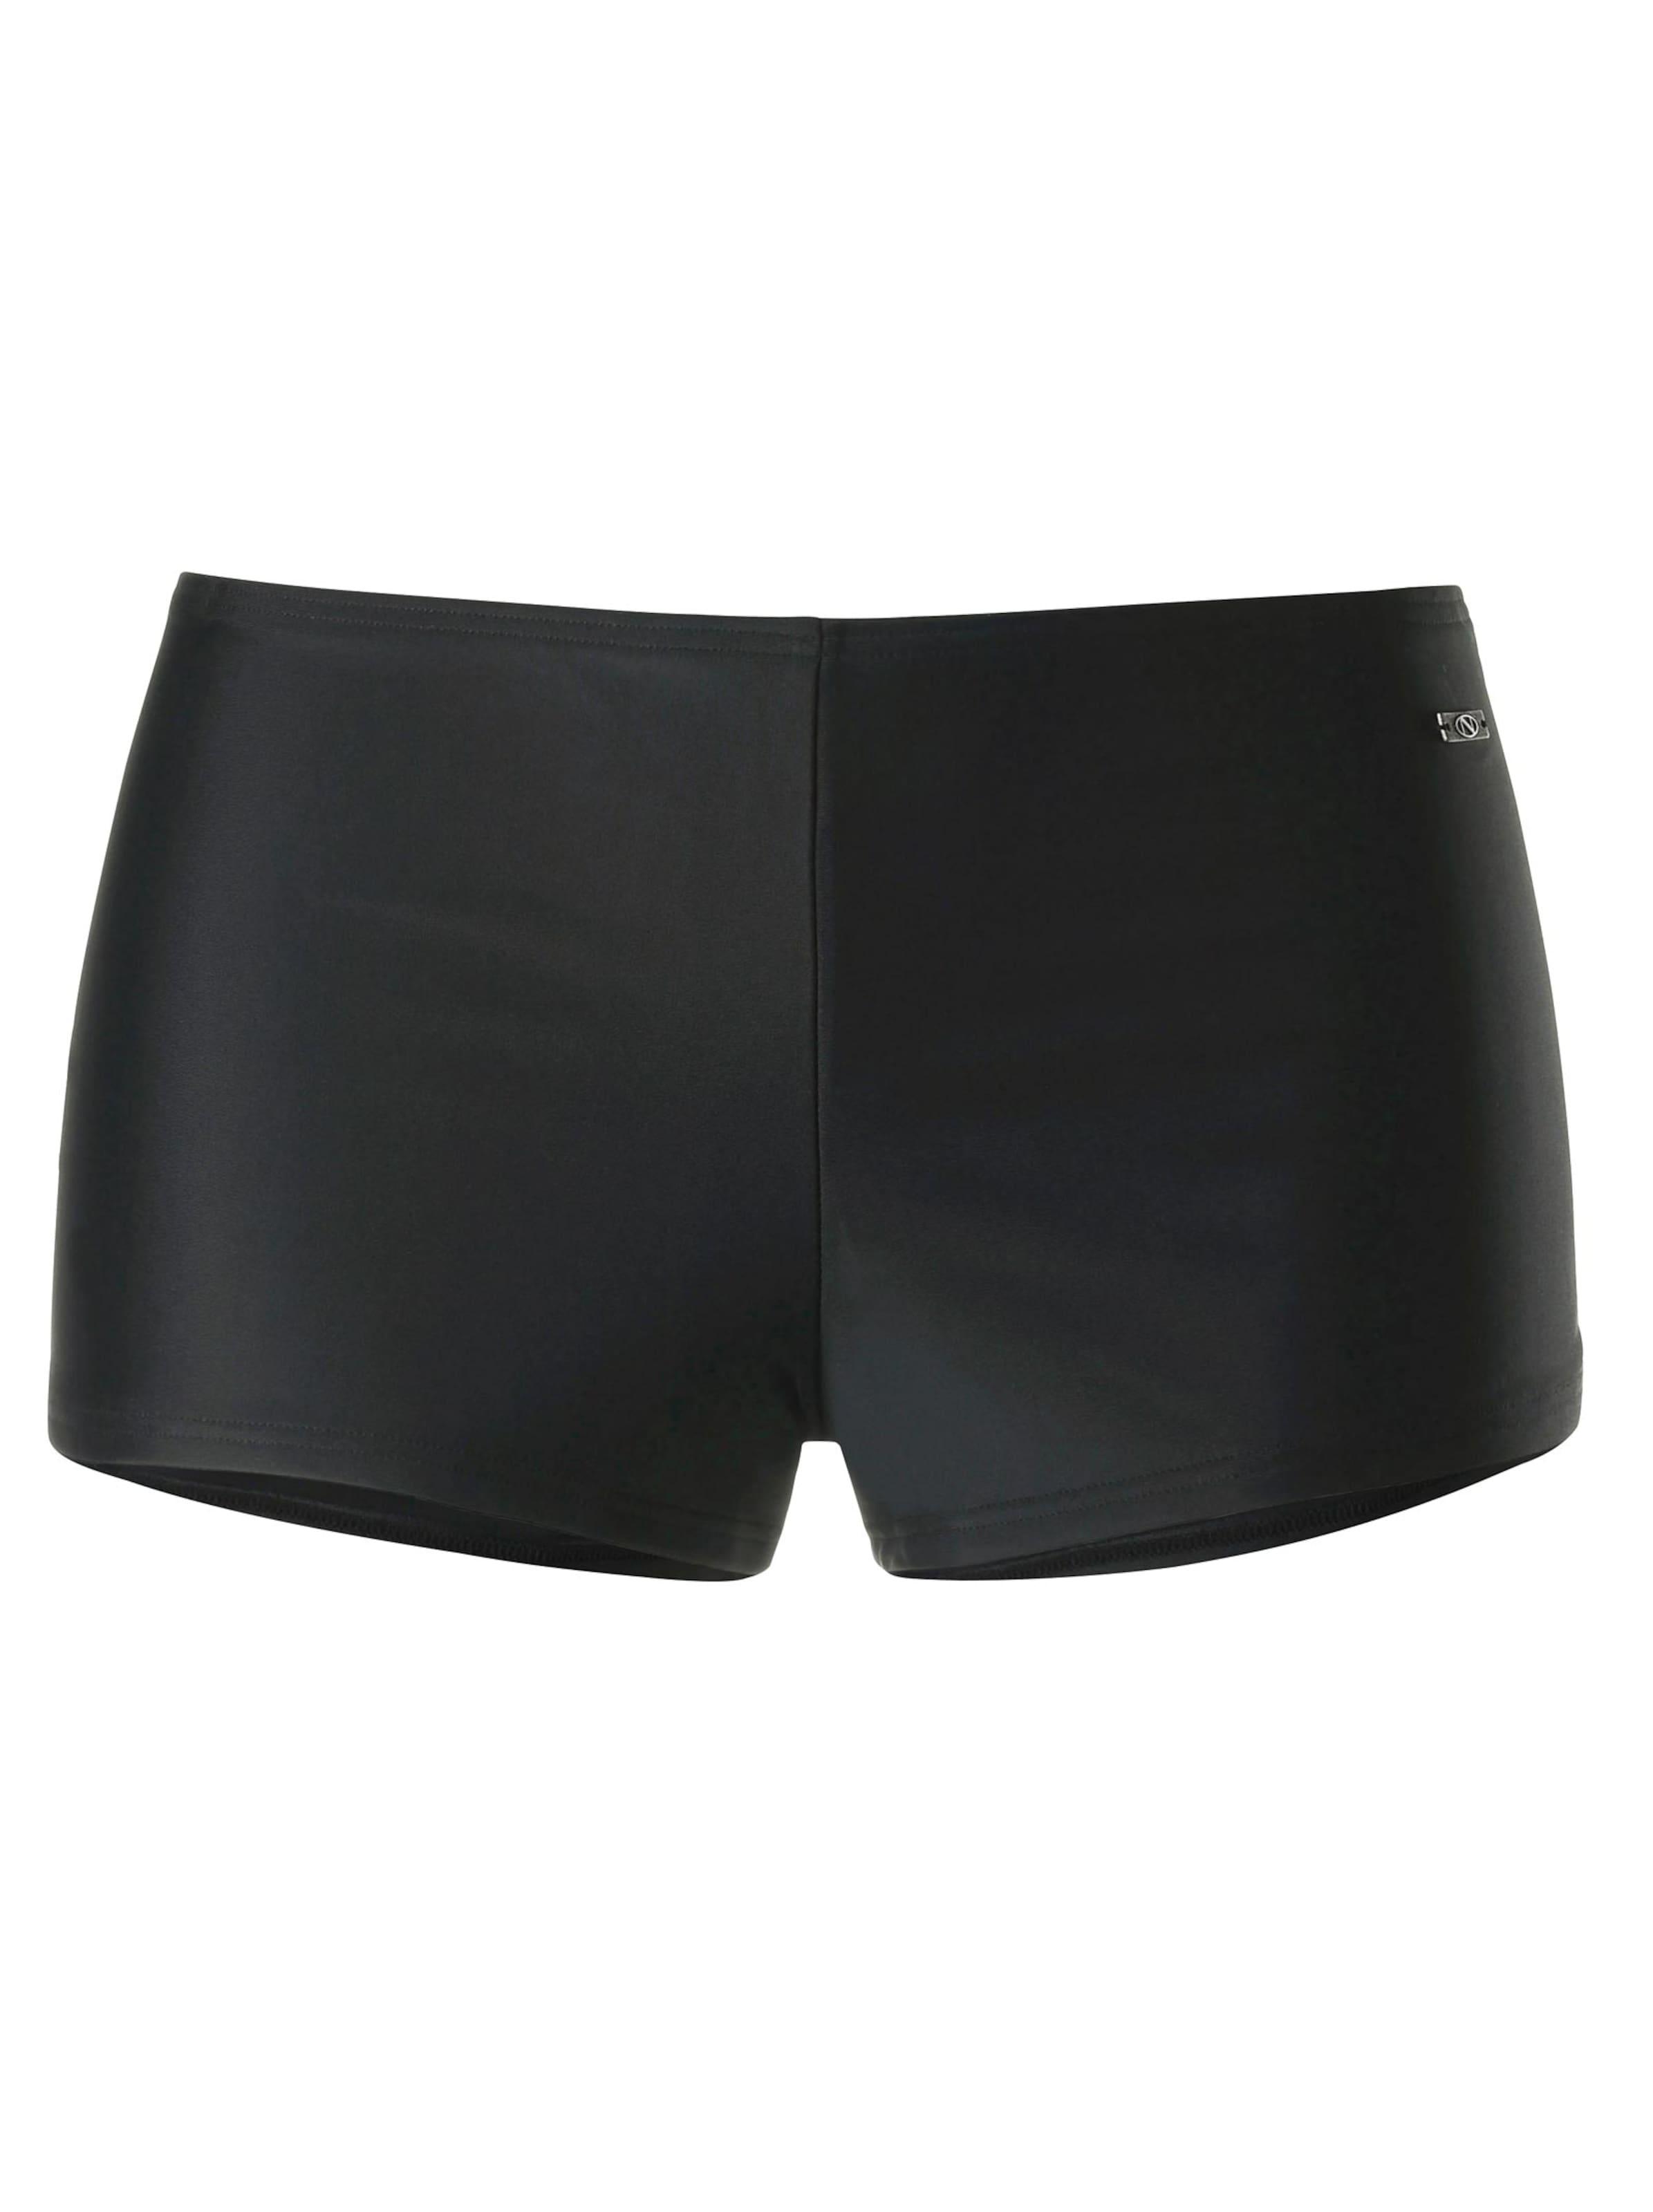 Bademode - Damen Bikini Hose schwarz  - Onlineshop Witt Weiden